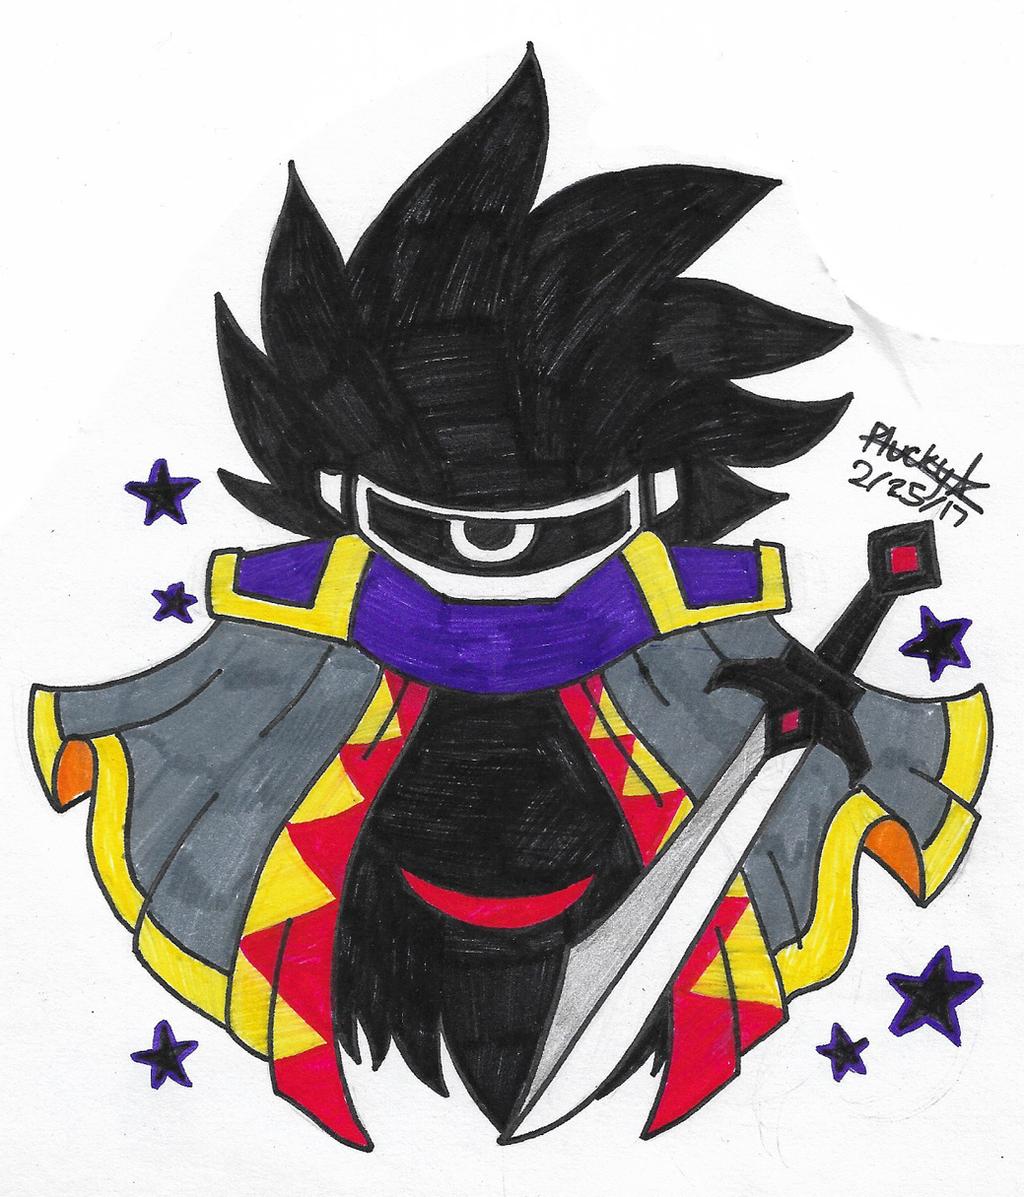 dark matter swordsman skylar - photo #42